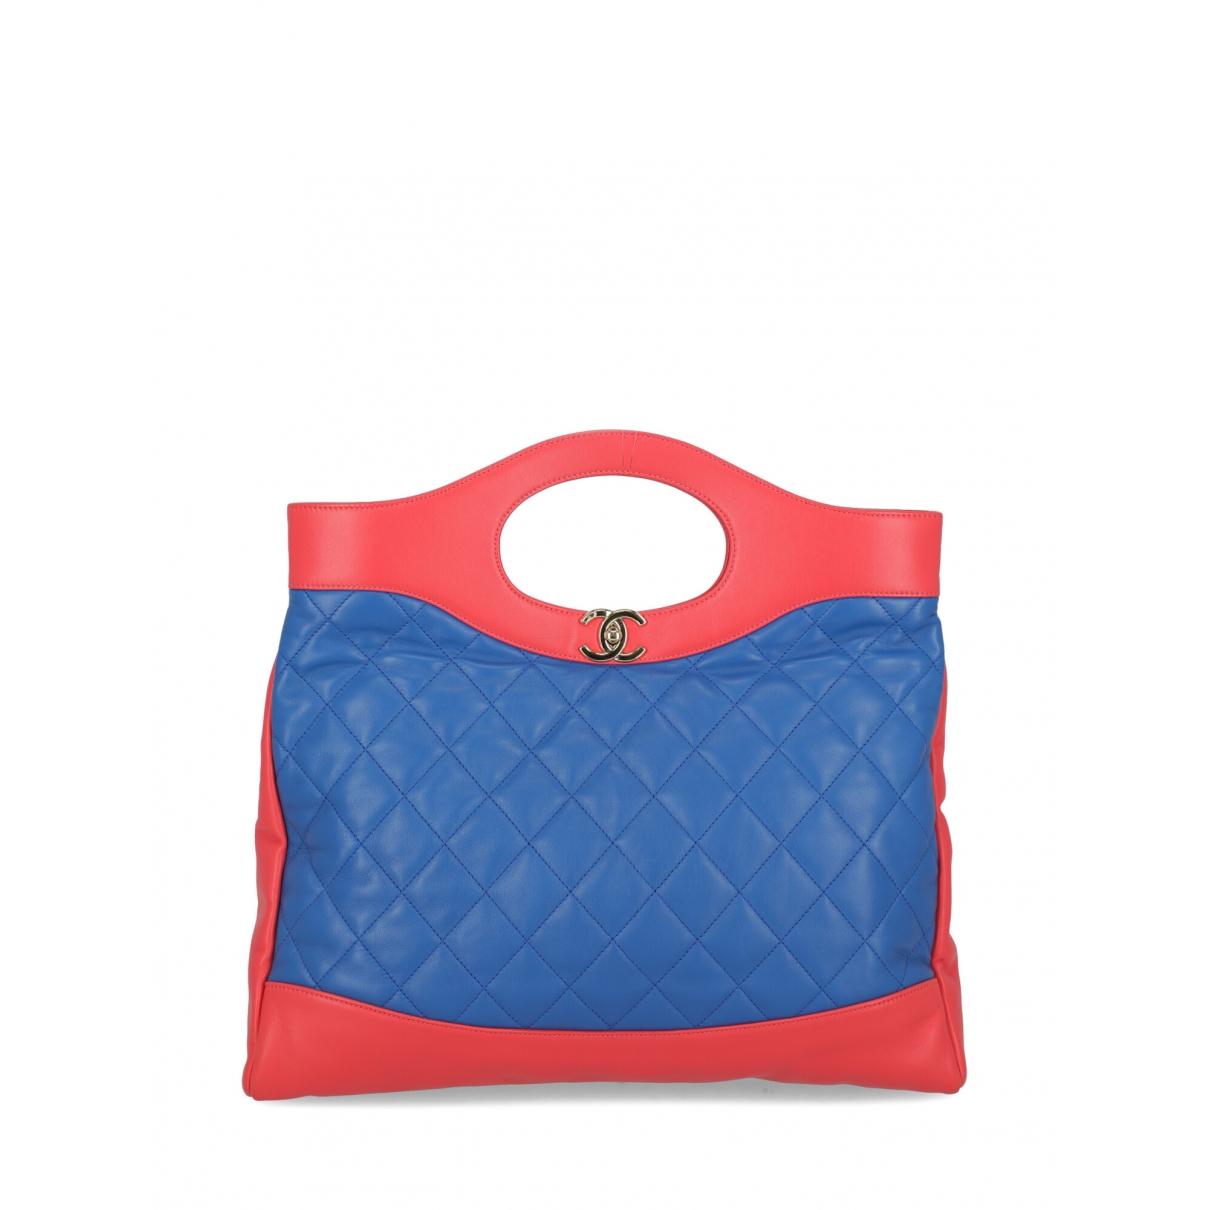 Chanel - Sac a main 31 pour femme en cuir - bleu